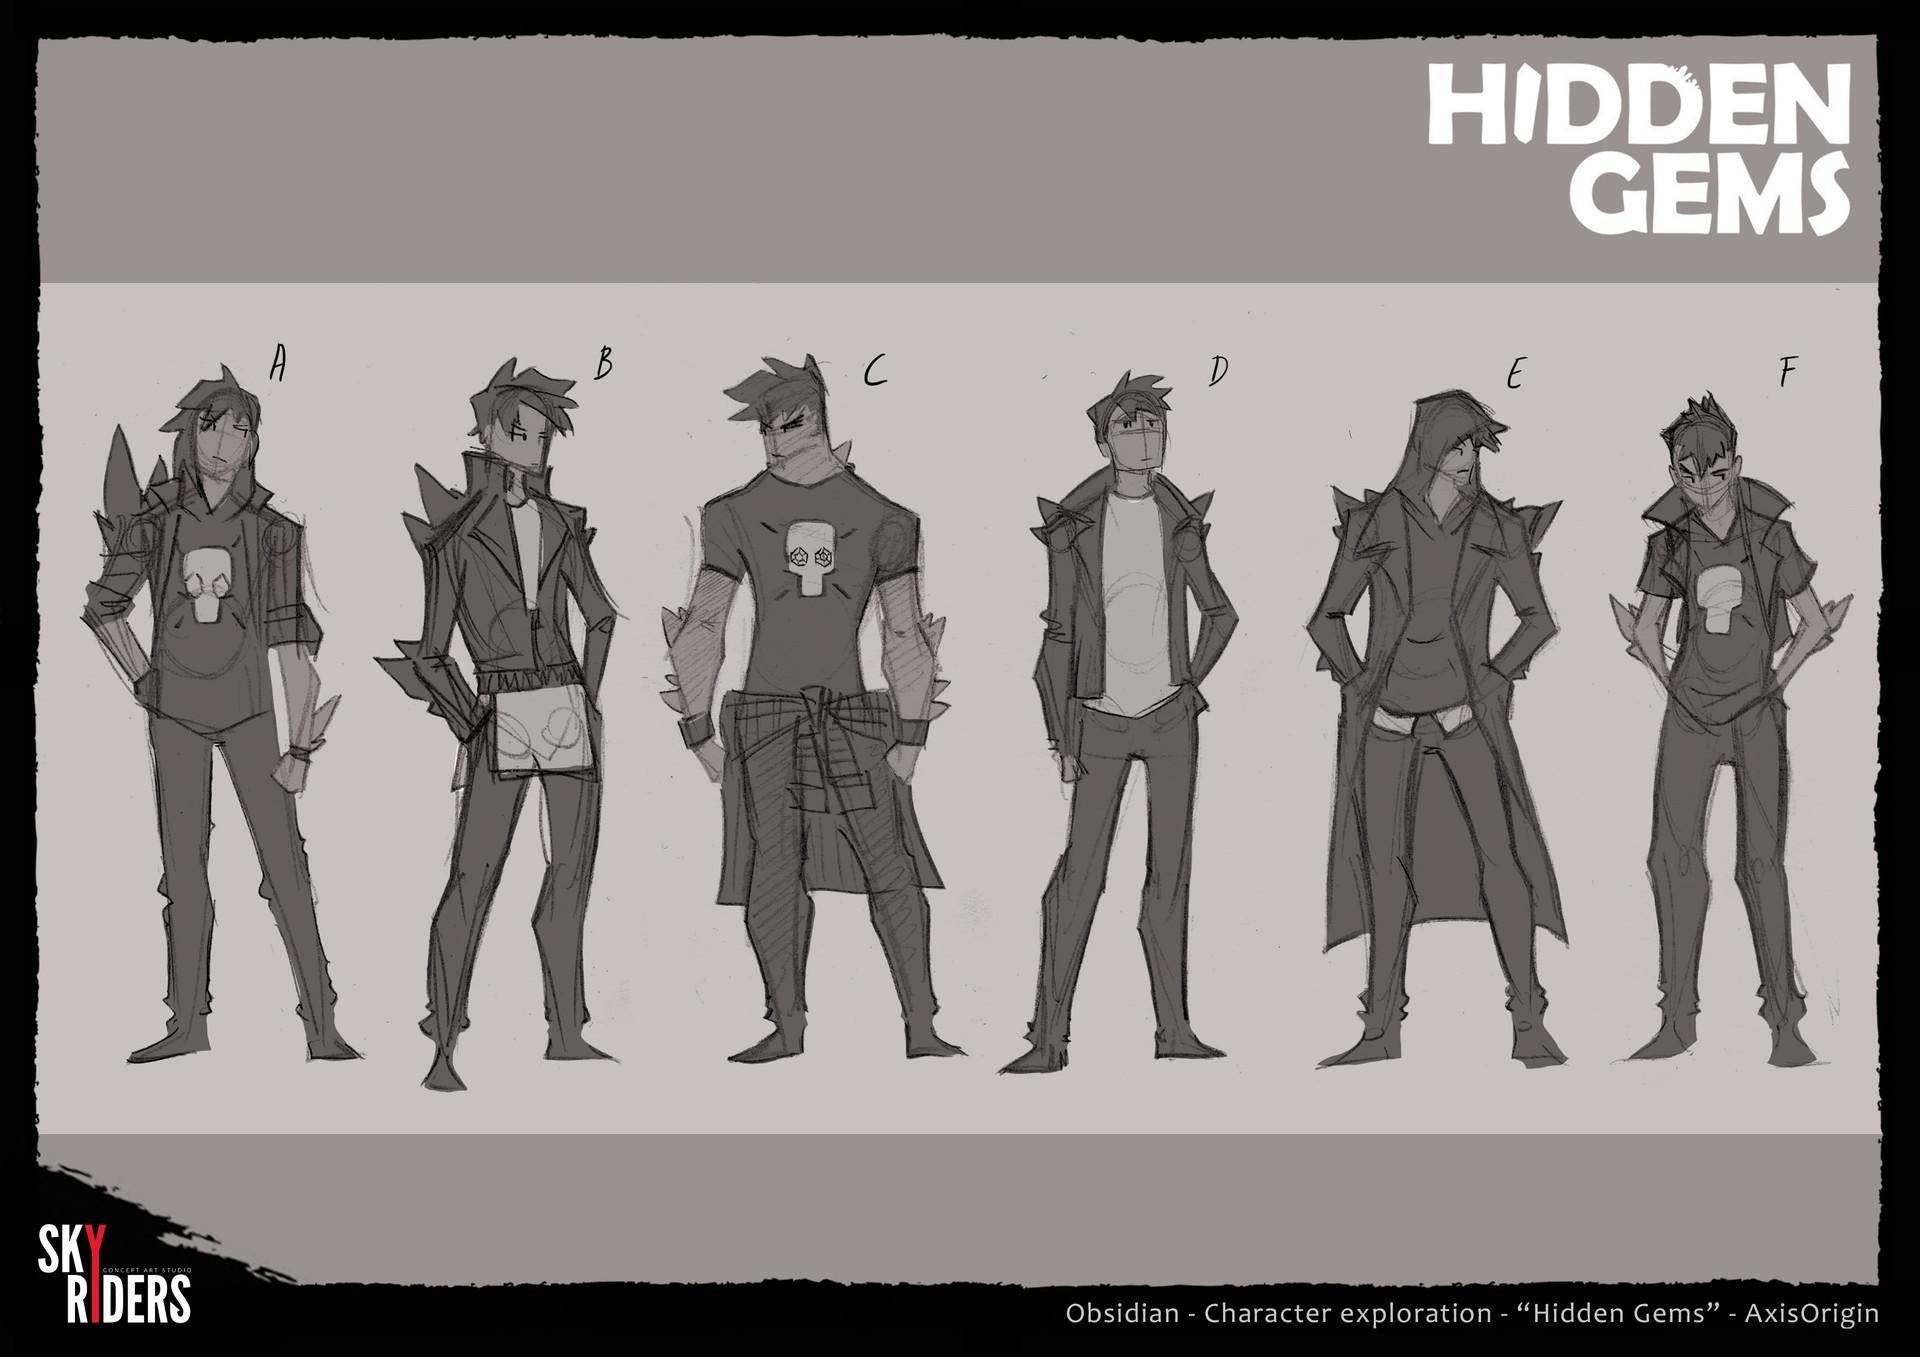 Sky riders hg 06